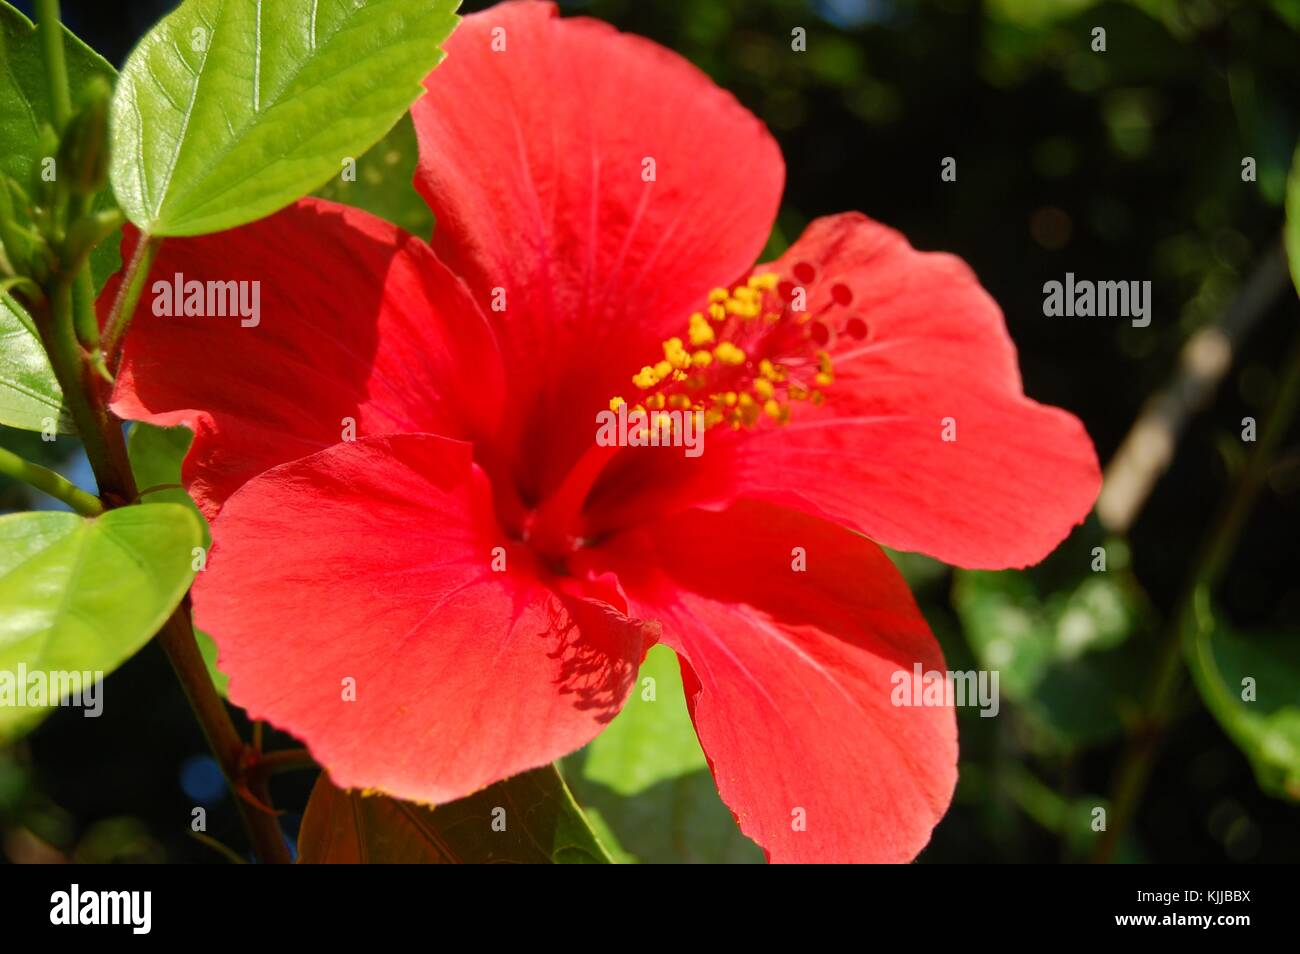 Red hibiscus flower hawaiian national symbol summer plant stock red hibiscus flower hawaiian national symbol summer plant blossoming izmirmasajfo